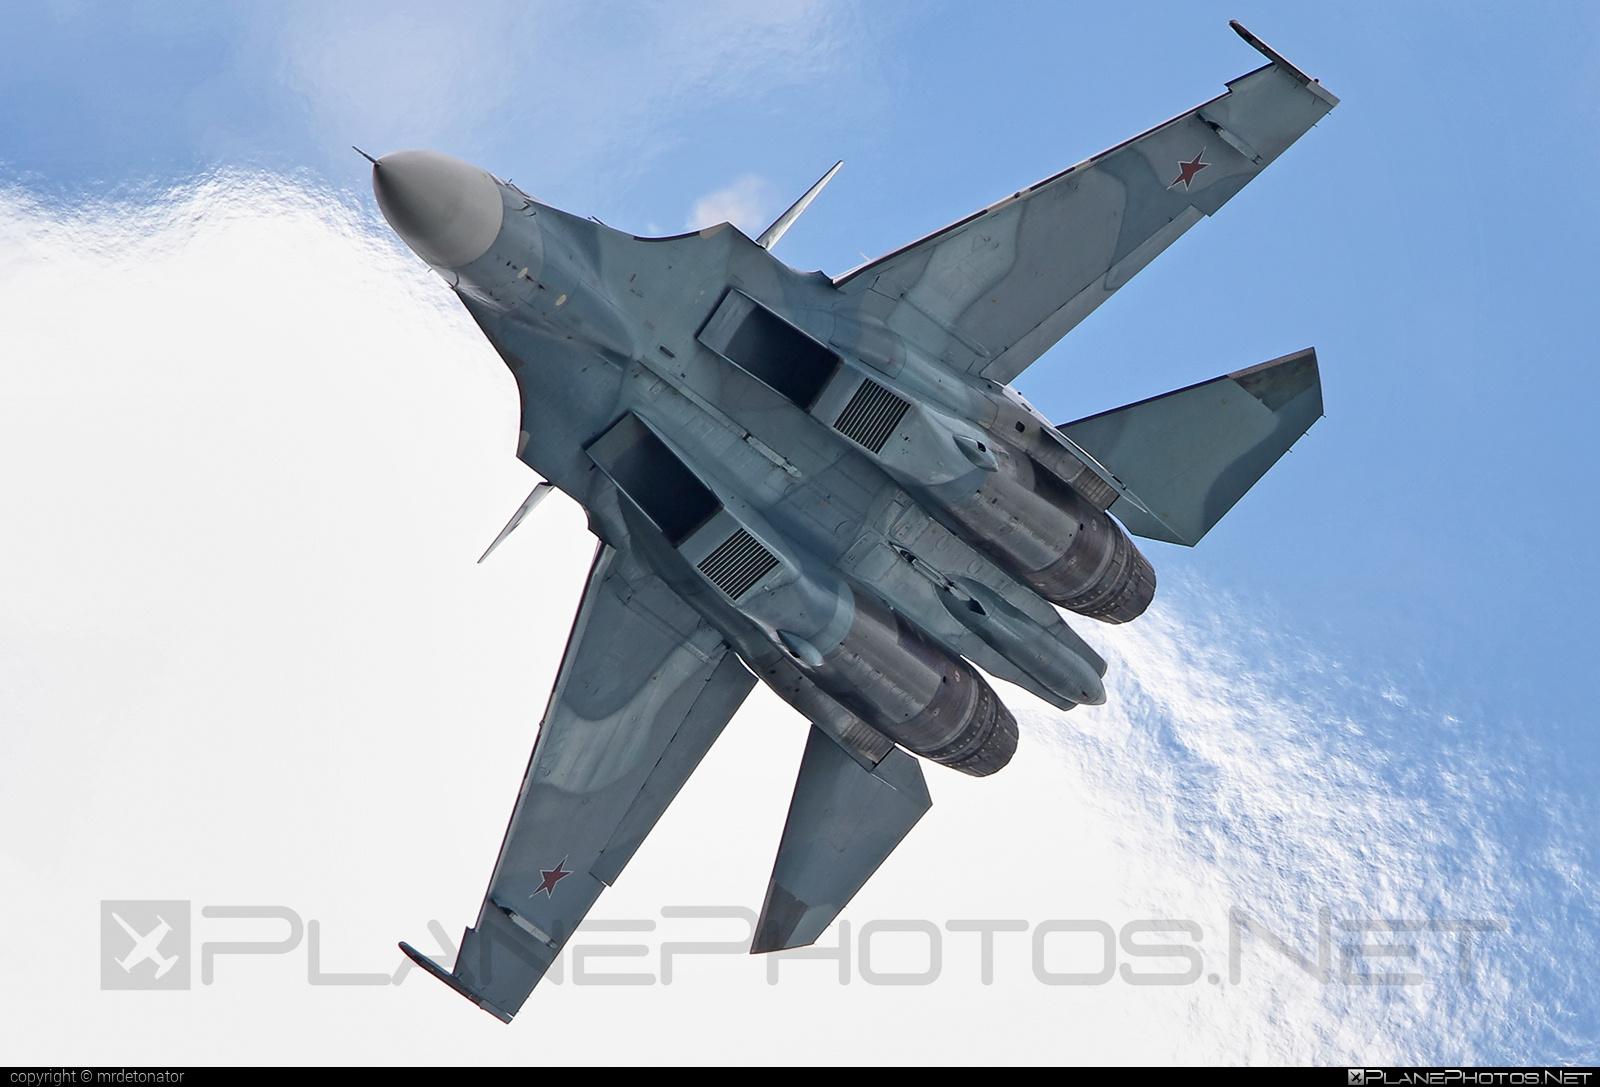 Sukhoi Su-30SM - 38 operated by Voyenno-vozdushnye sily Rossii (Russian Air Force) #maks2015 #su30 #su30sm #sukhoi #sukhoi30 #sukhoisu30sm